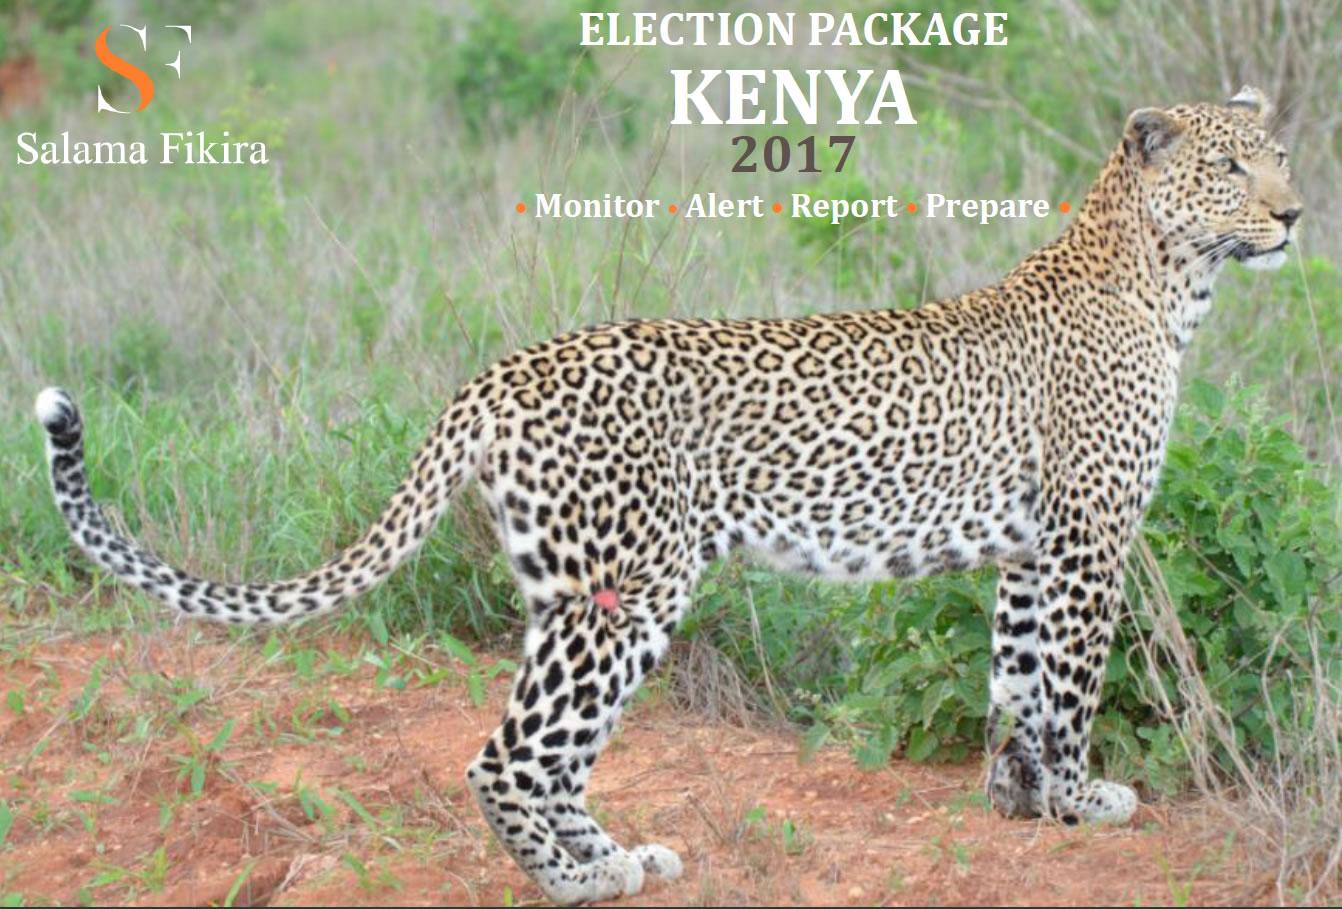 kenya-election-image